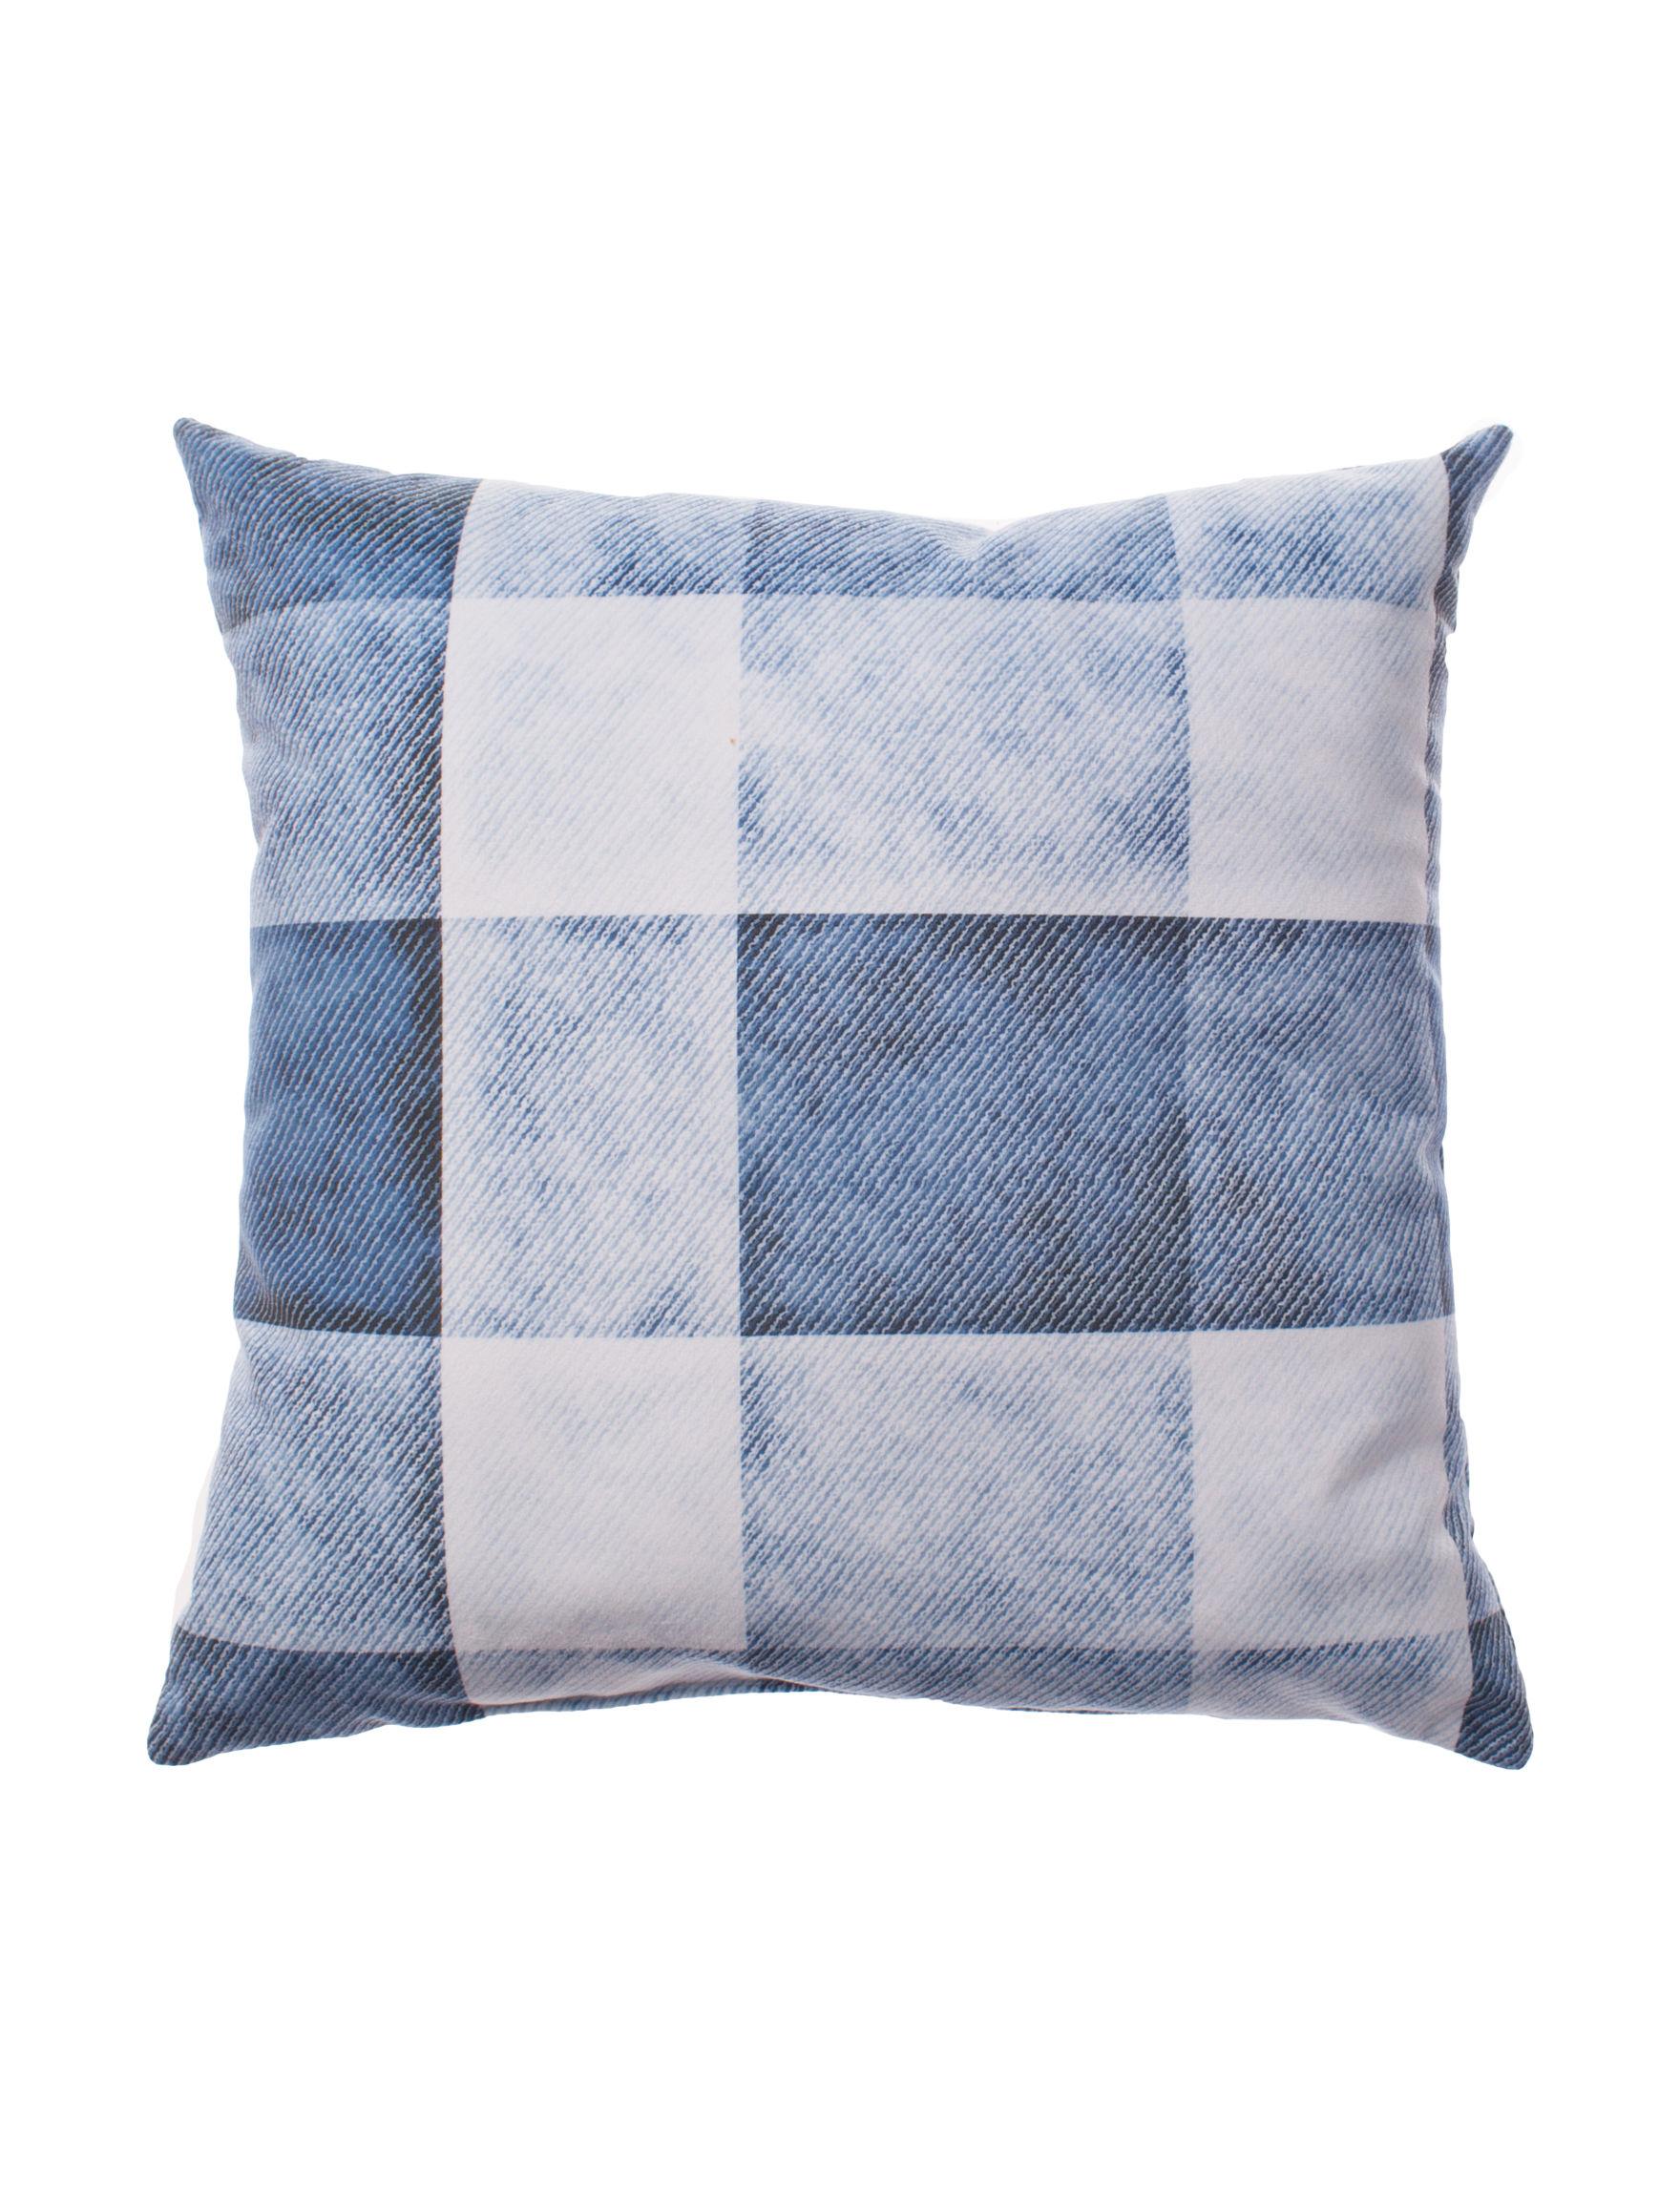 Home Fashions International Blue Multi Decorative Pillows